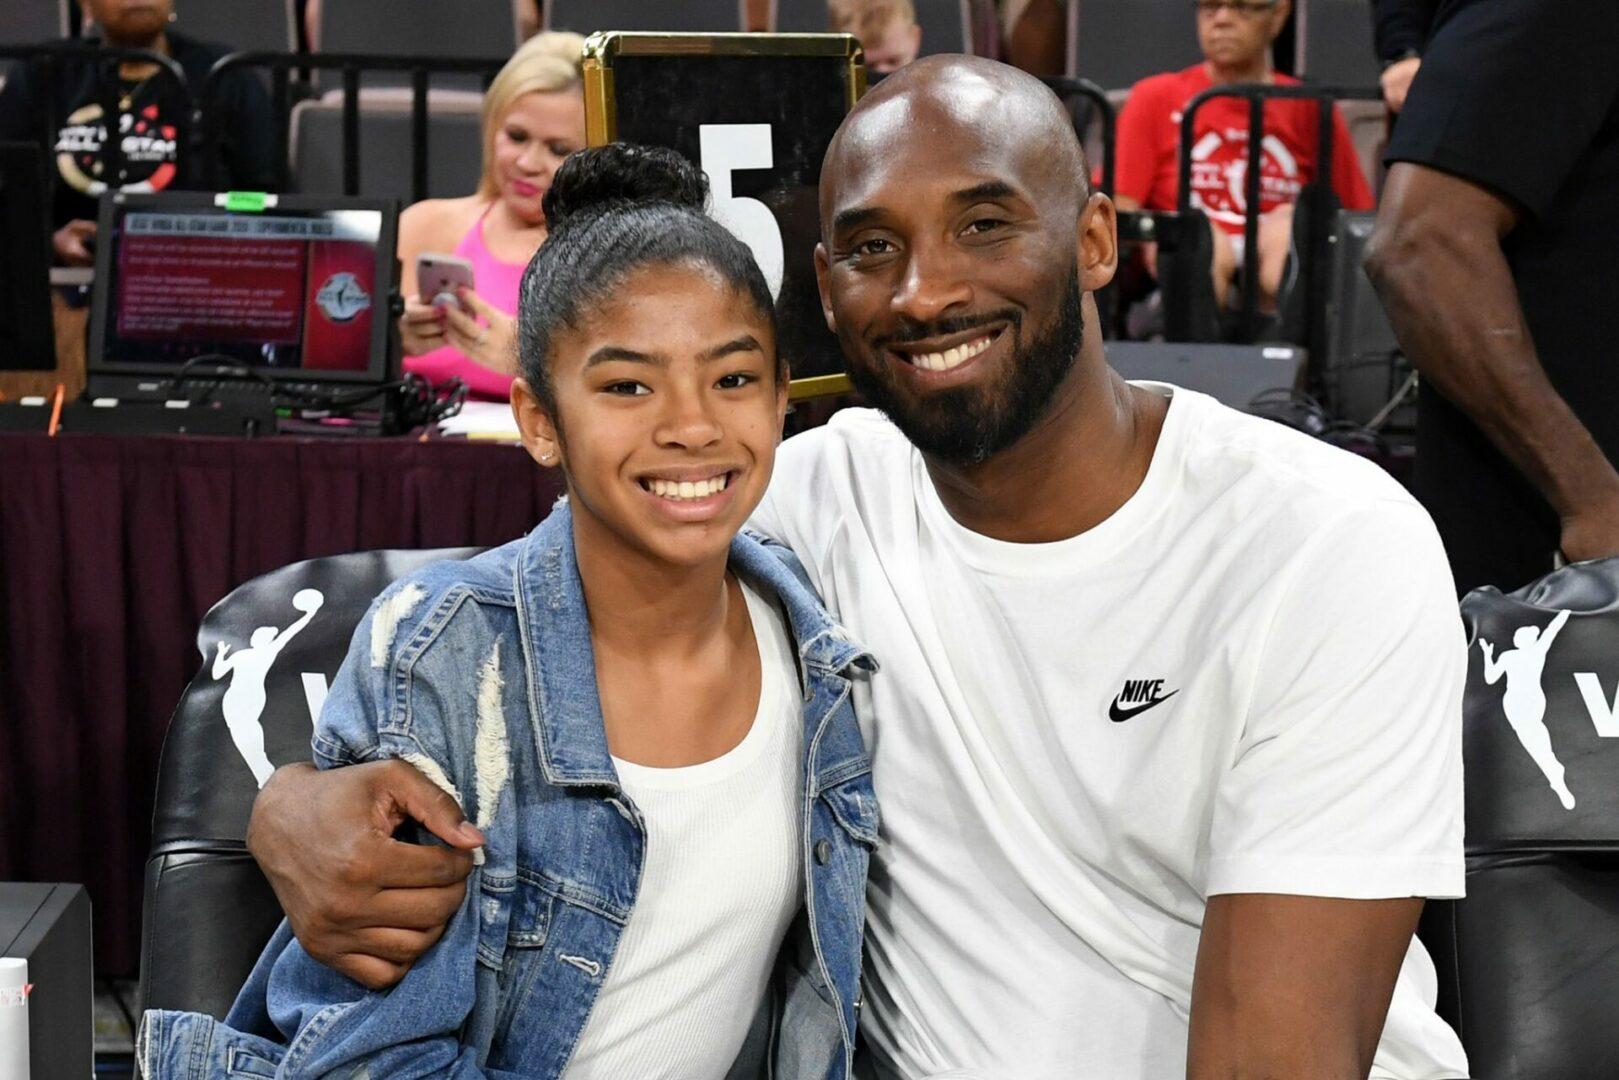 Kobe and Gianna Maria